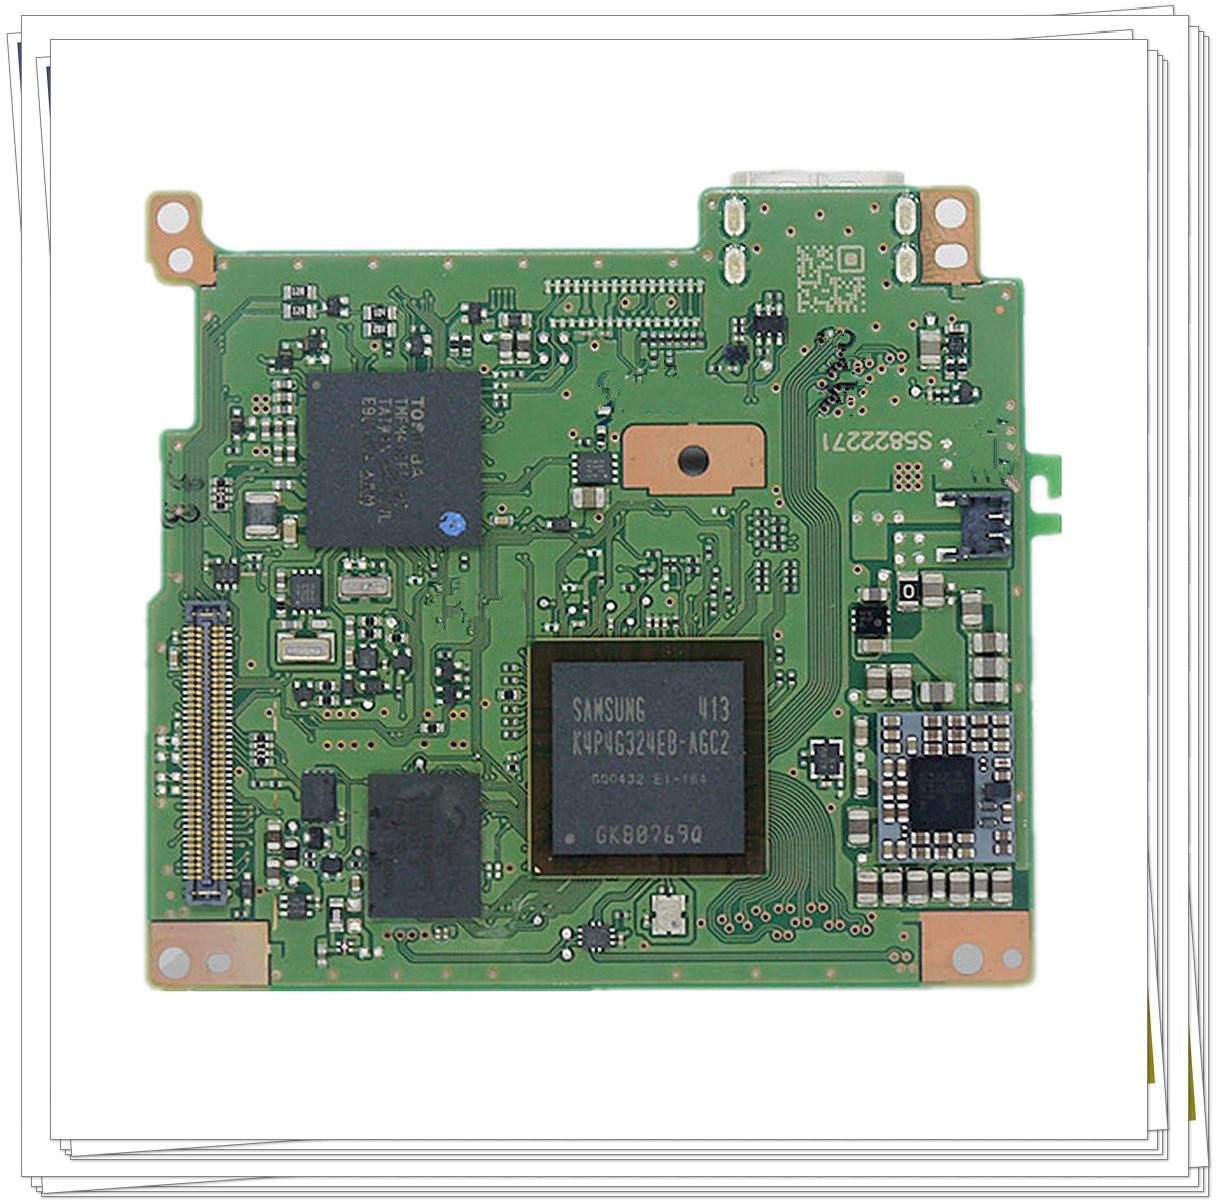 где купить free shipping original D5500 motherboard for nikon D5500 mainboard D5500 Main board DSLR camera repair parts по лучшей цене